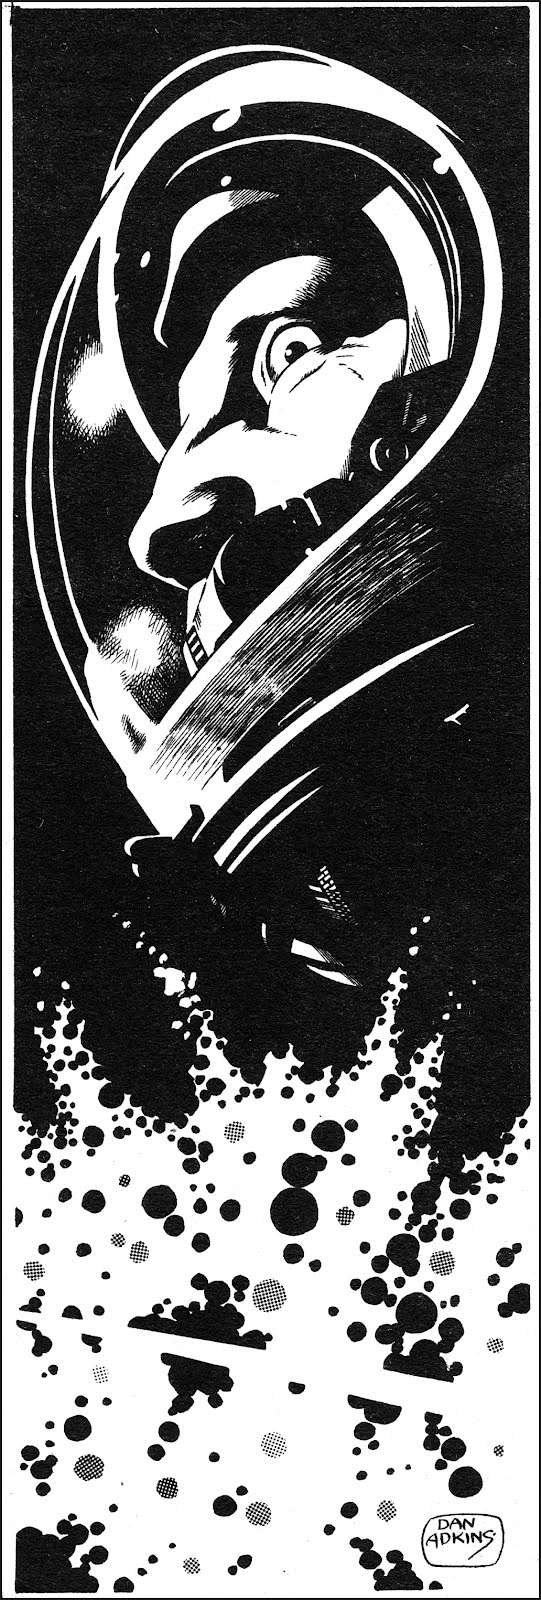 a Dan Adkins illustration of a astronaut in trouble